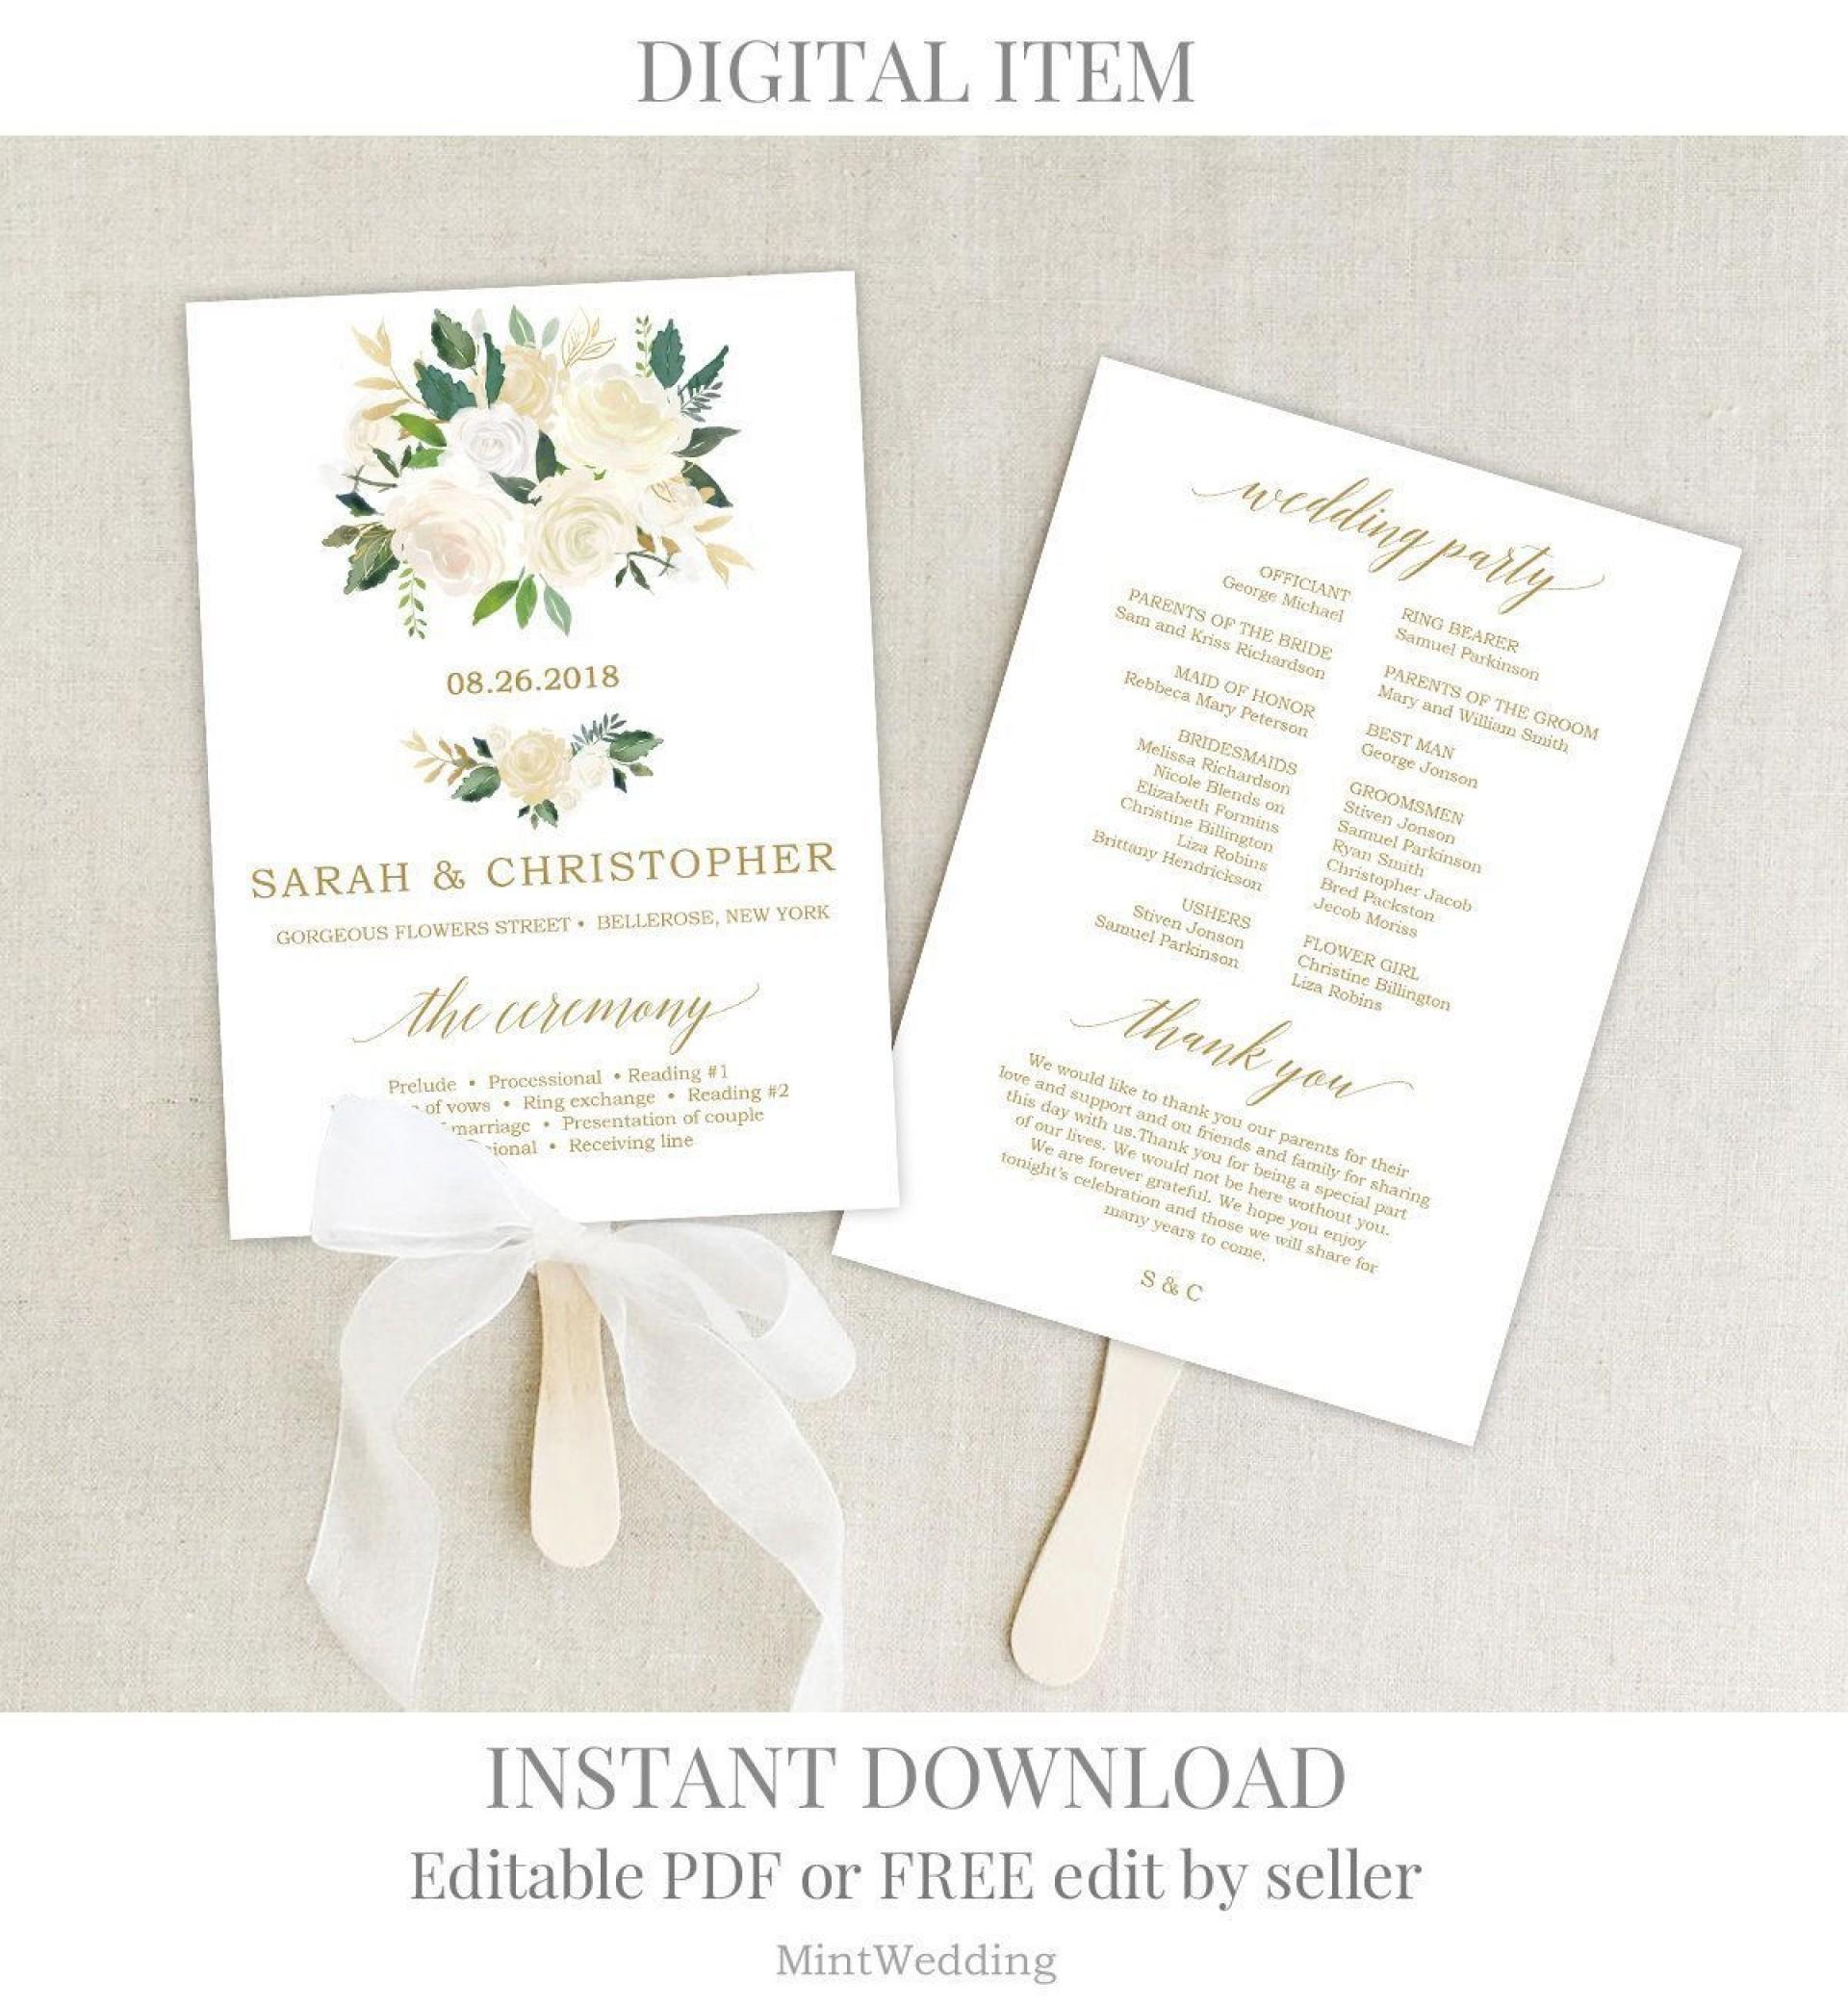 001 Impressive Free Wedding Program Fan Template High Def  Templates Printable Paddle Word1920